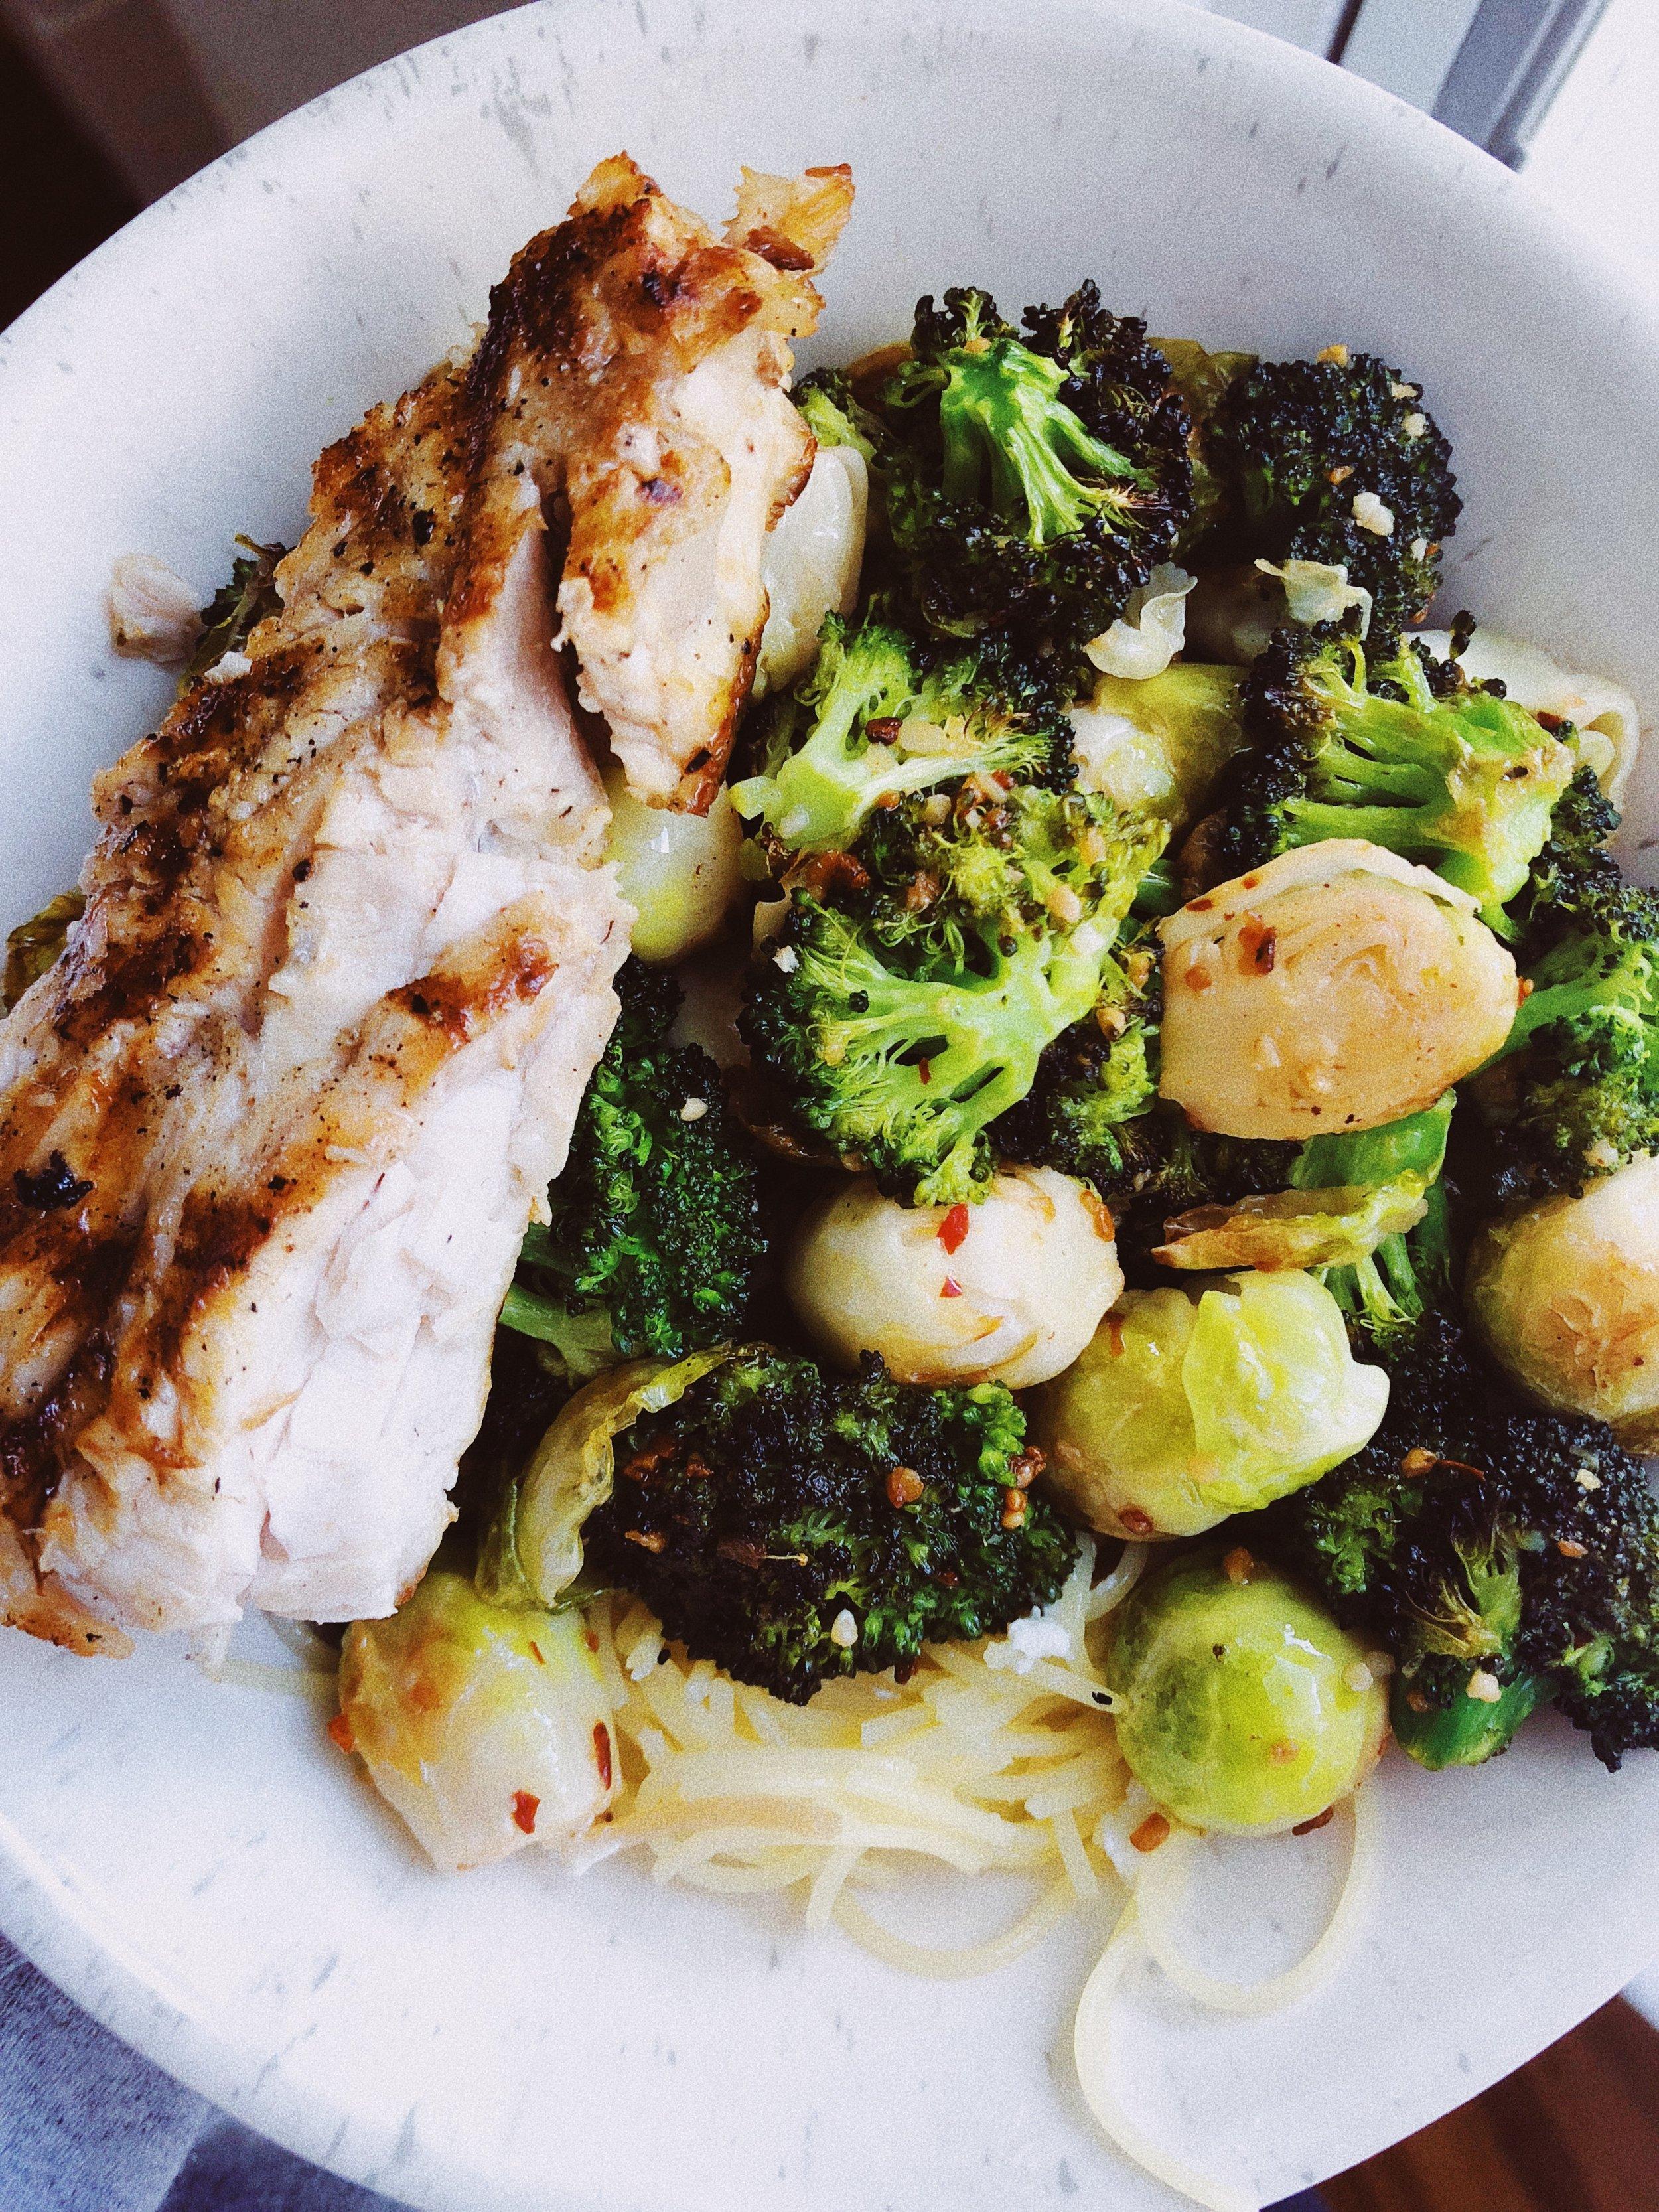 swordfish and veggies